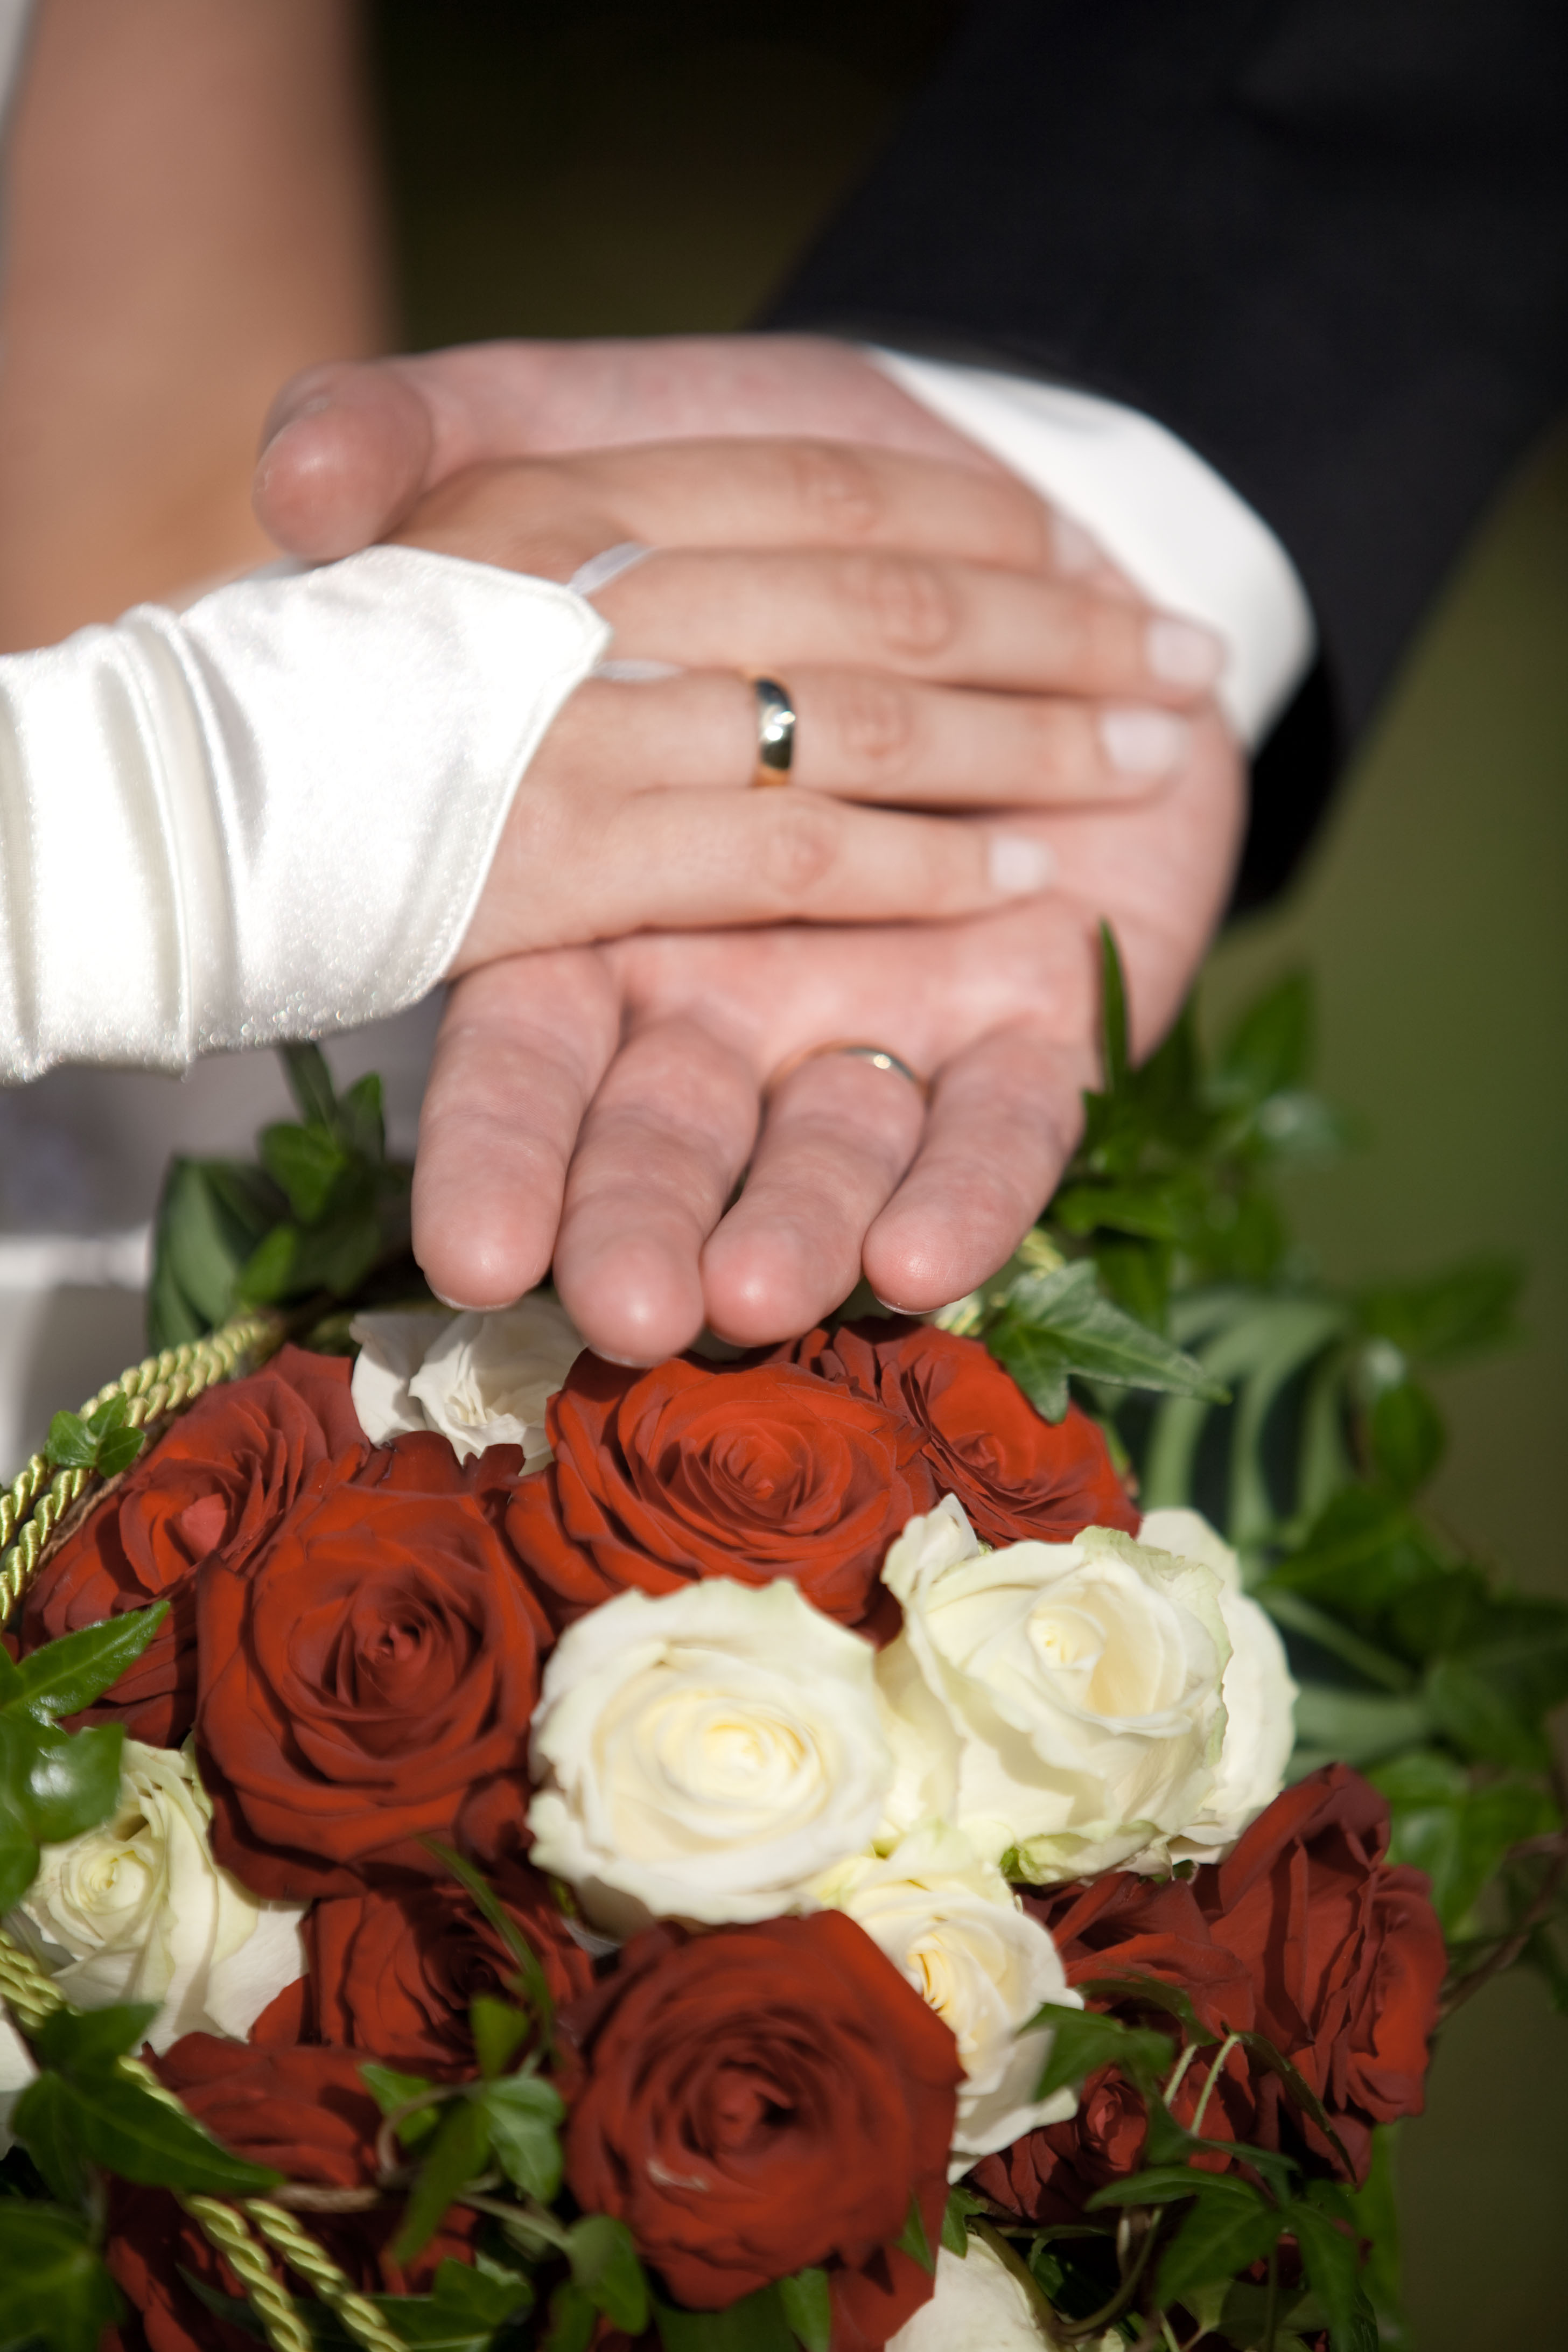 Hochzeit kirche kollekte